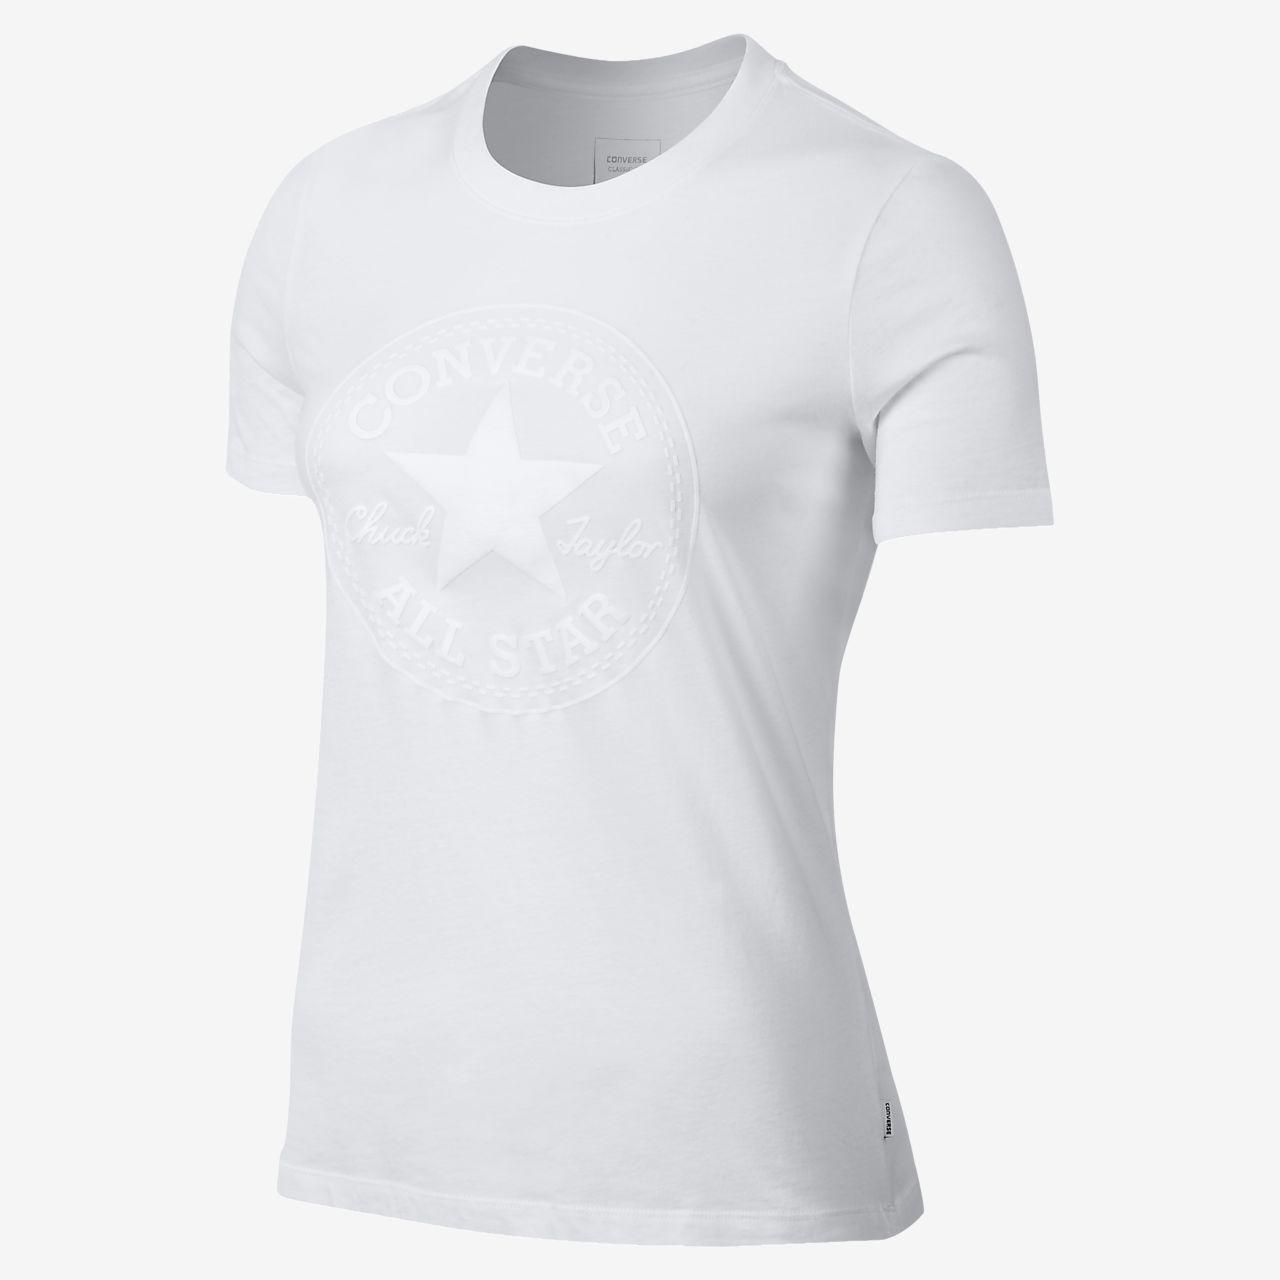 Converse Puff Chuck Patch Crew Women's T-Shirts Black